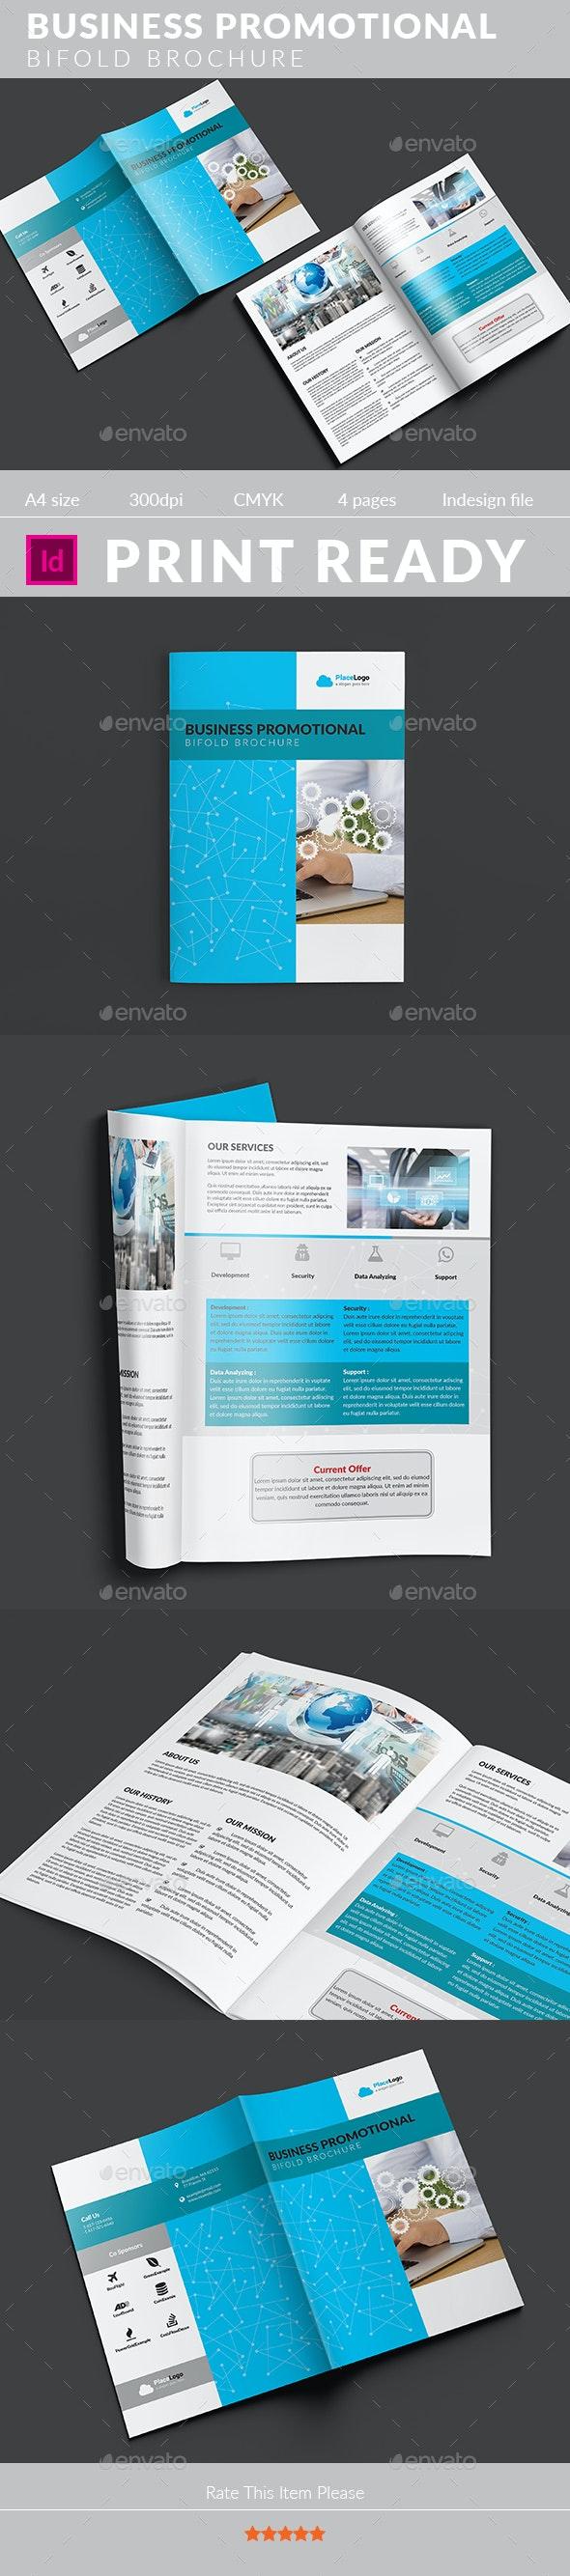 Business Promotional Bifold Brochure - Corporate Brochures